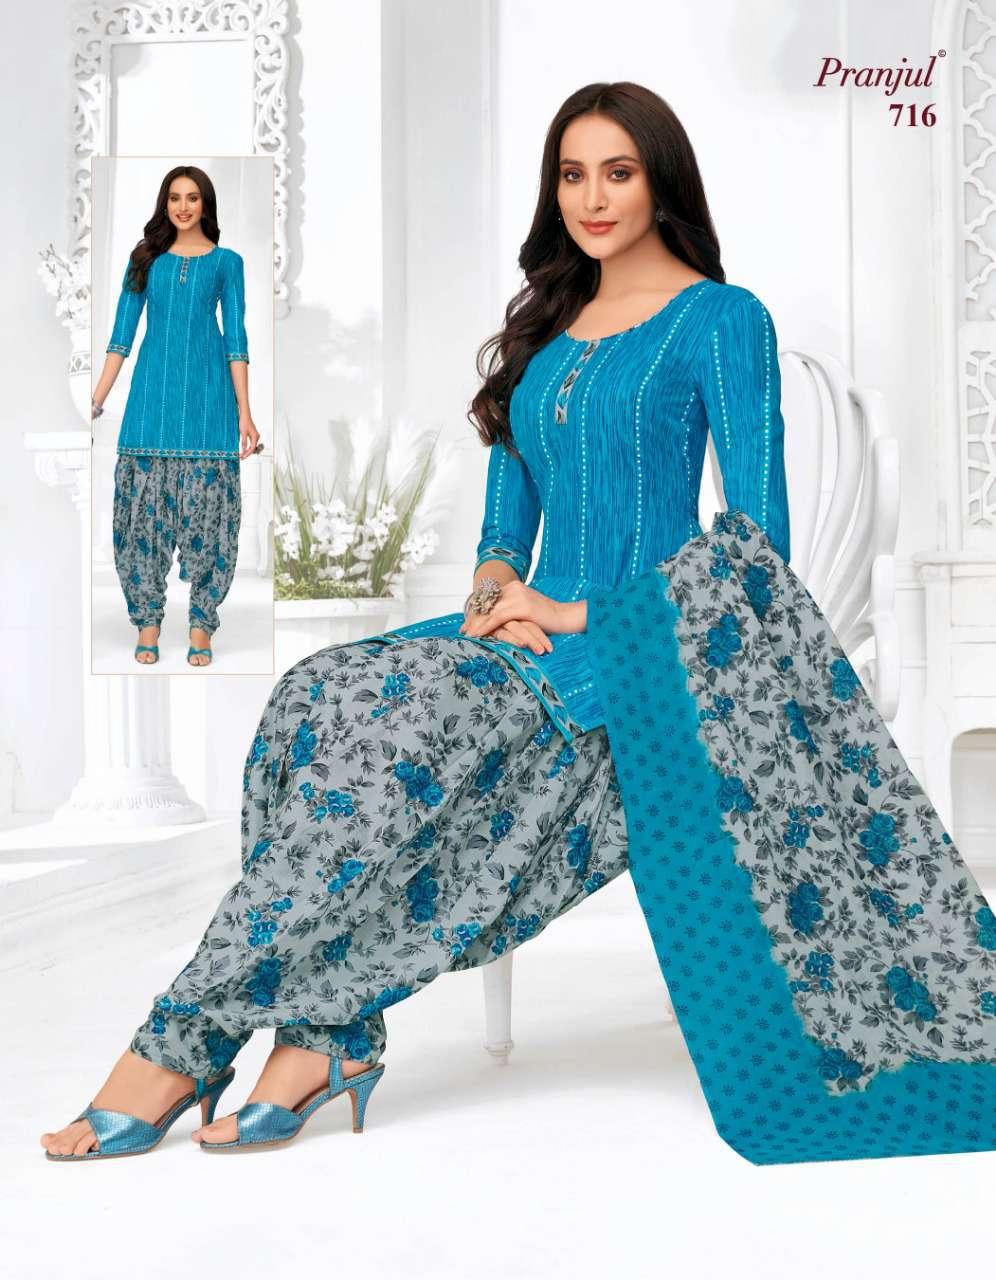 Pranjul Priyanka Vol 7 A Readymade Suit Wholesale Catalog 15 Pcs 11 - Pranjul Priyanka Vol 7 A Readymade Suit Wholesale Catalog 15 Pcs